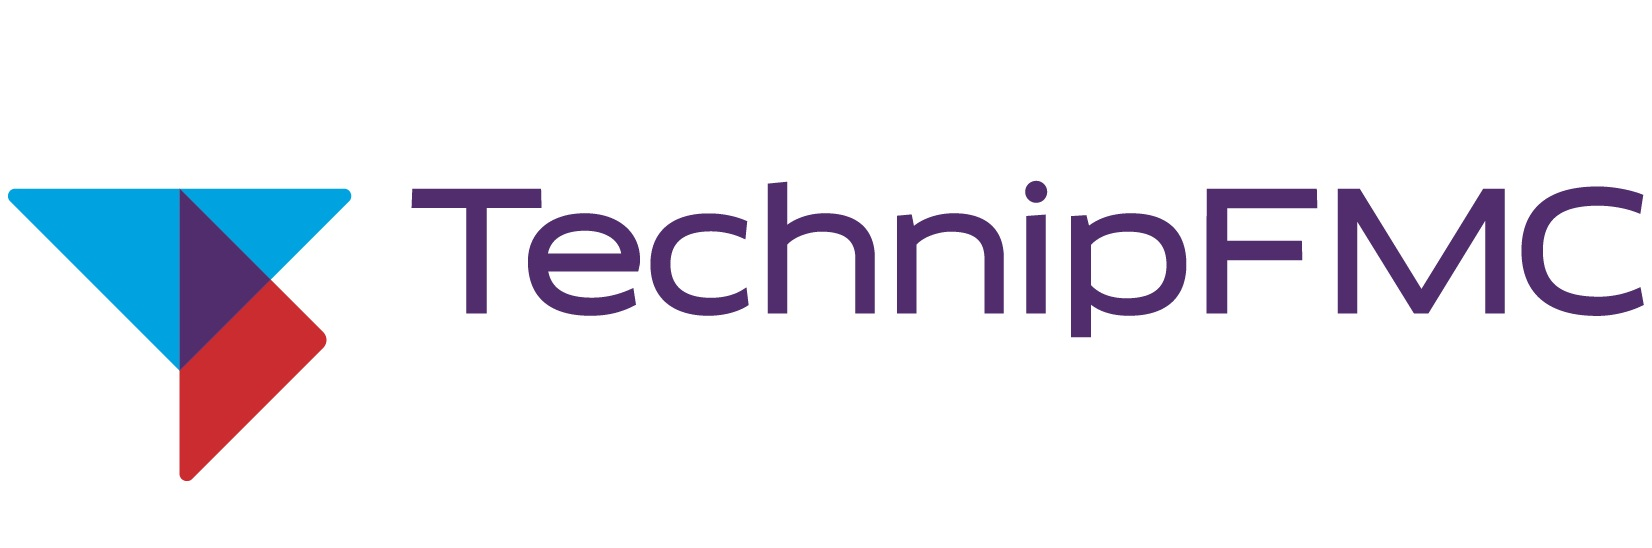 TechnipFMC logo.jpg